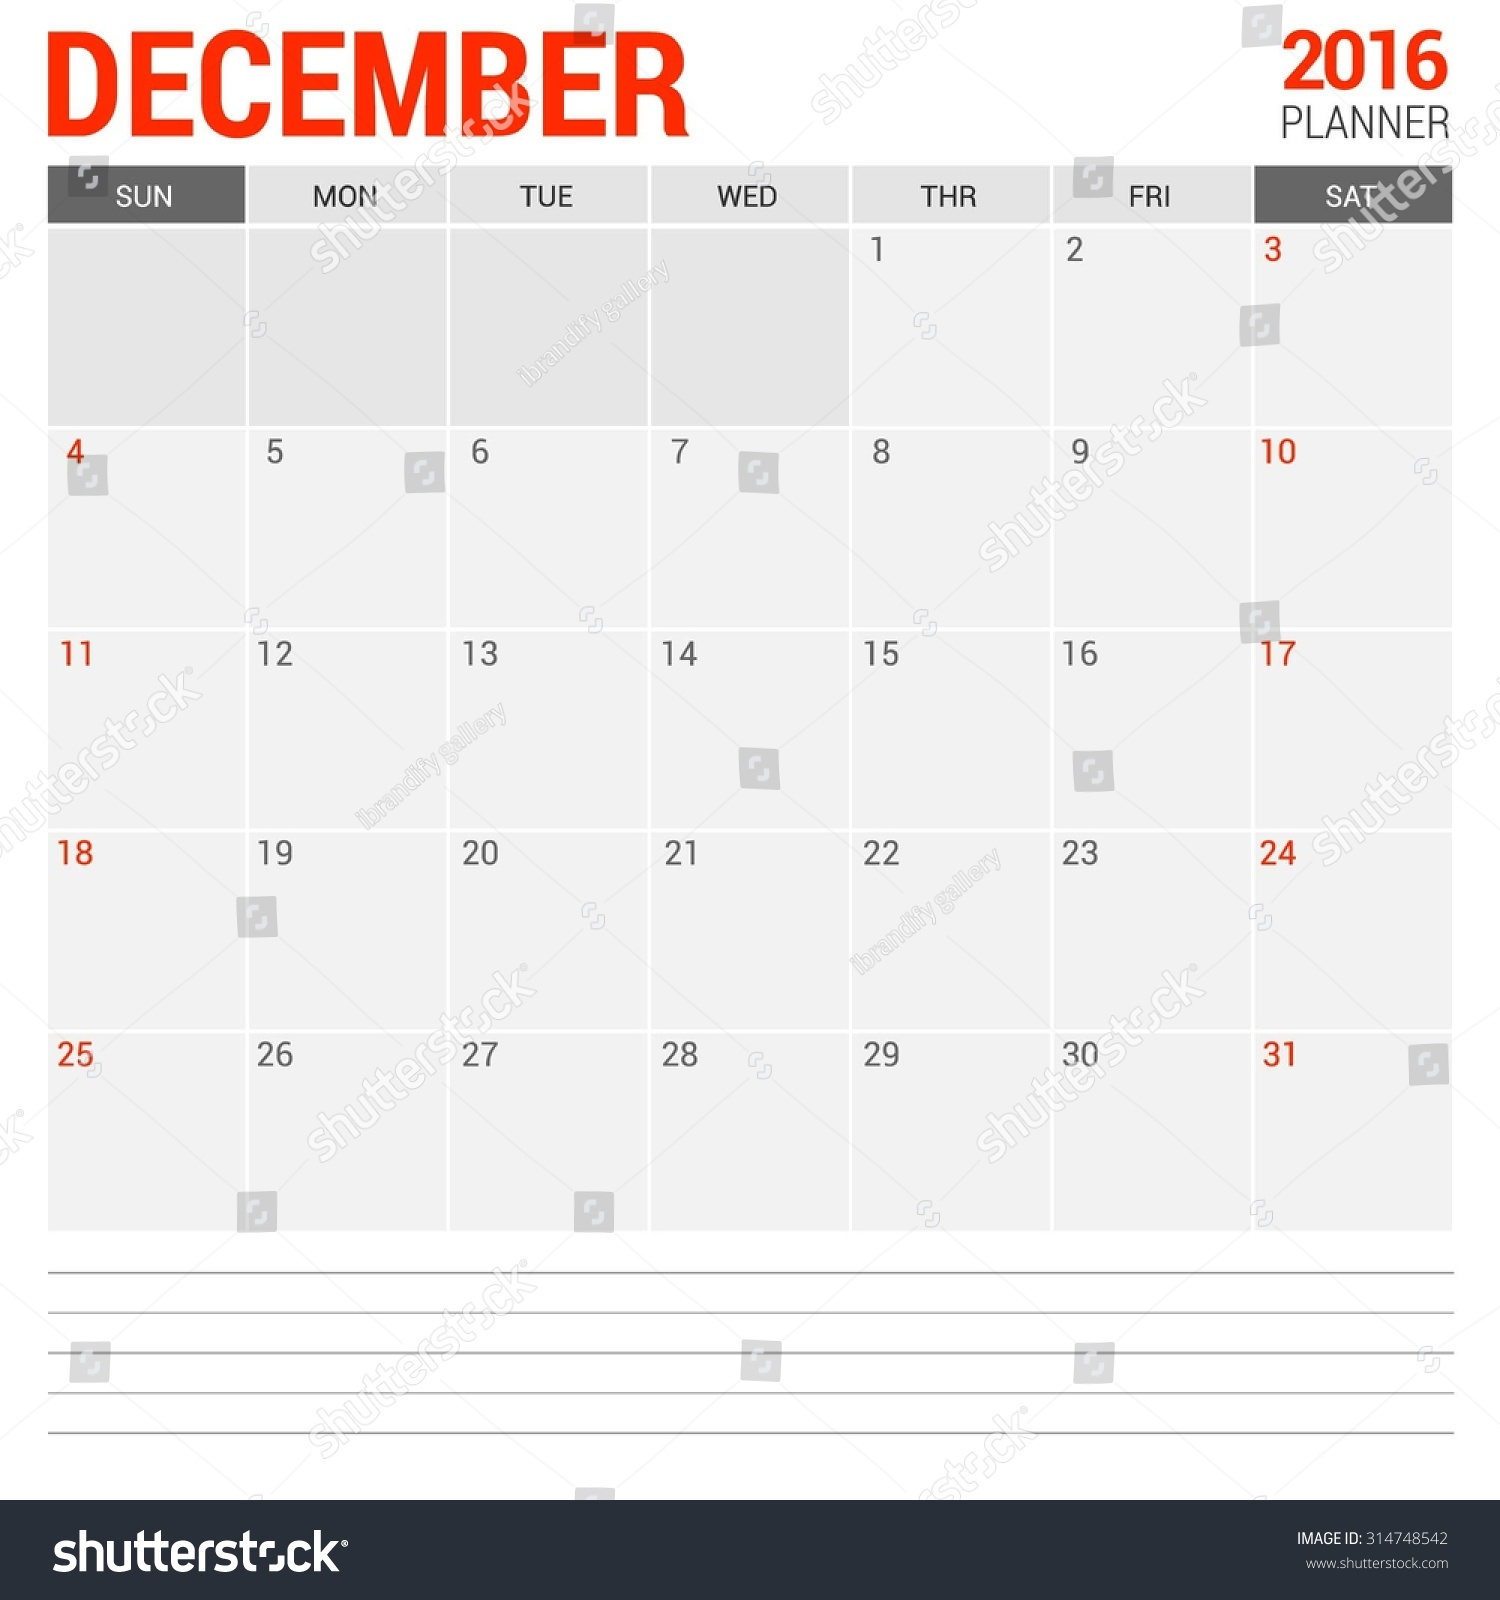 Calendar Planner Vector : December calendar planner vector design stock